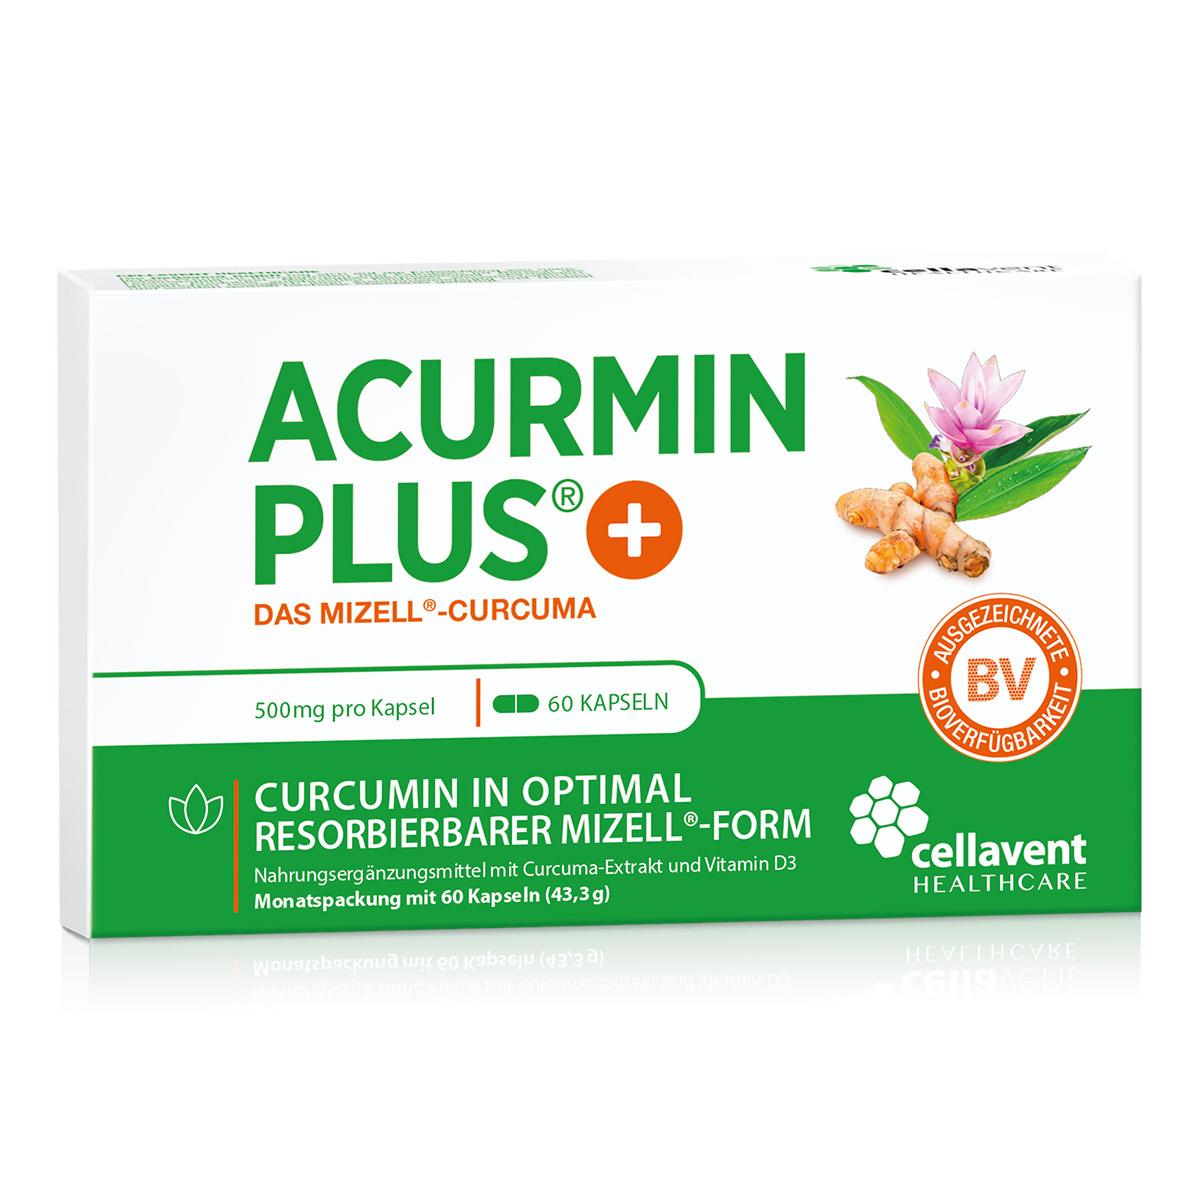 kurkuma-kapseln-acurmin-plus-60-stueck-verpackung-vorne-1200x1200